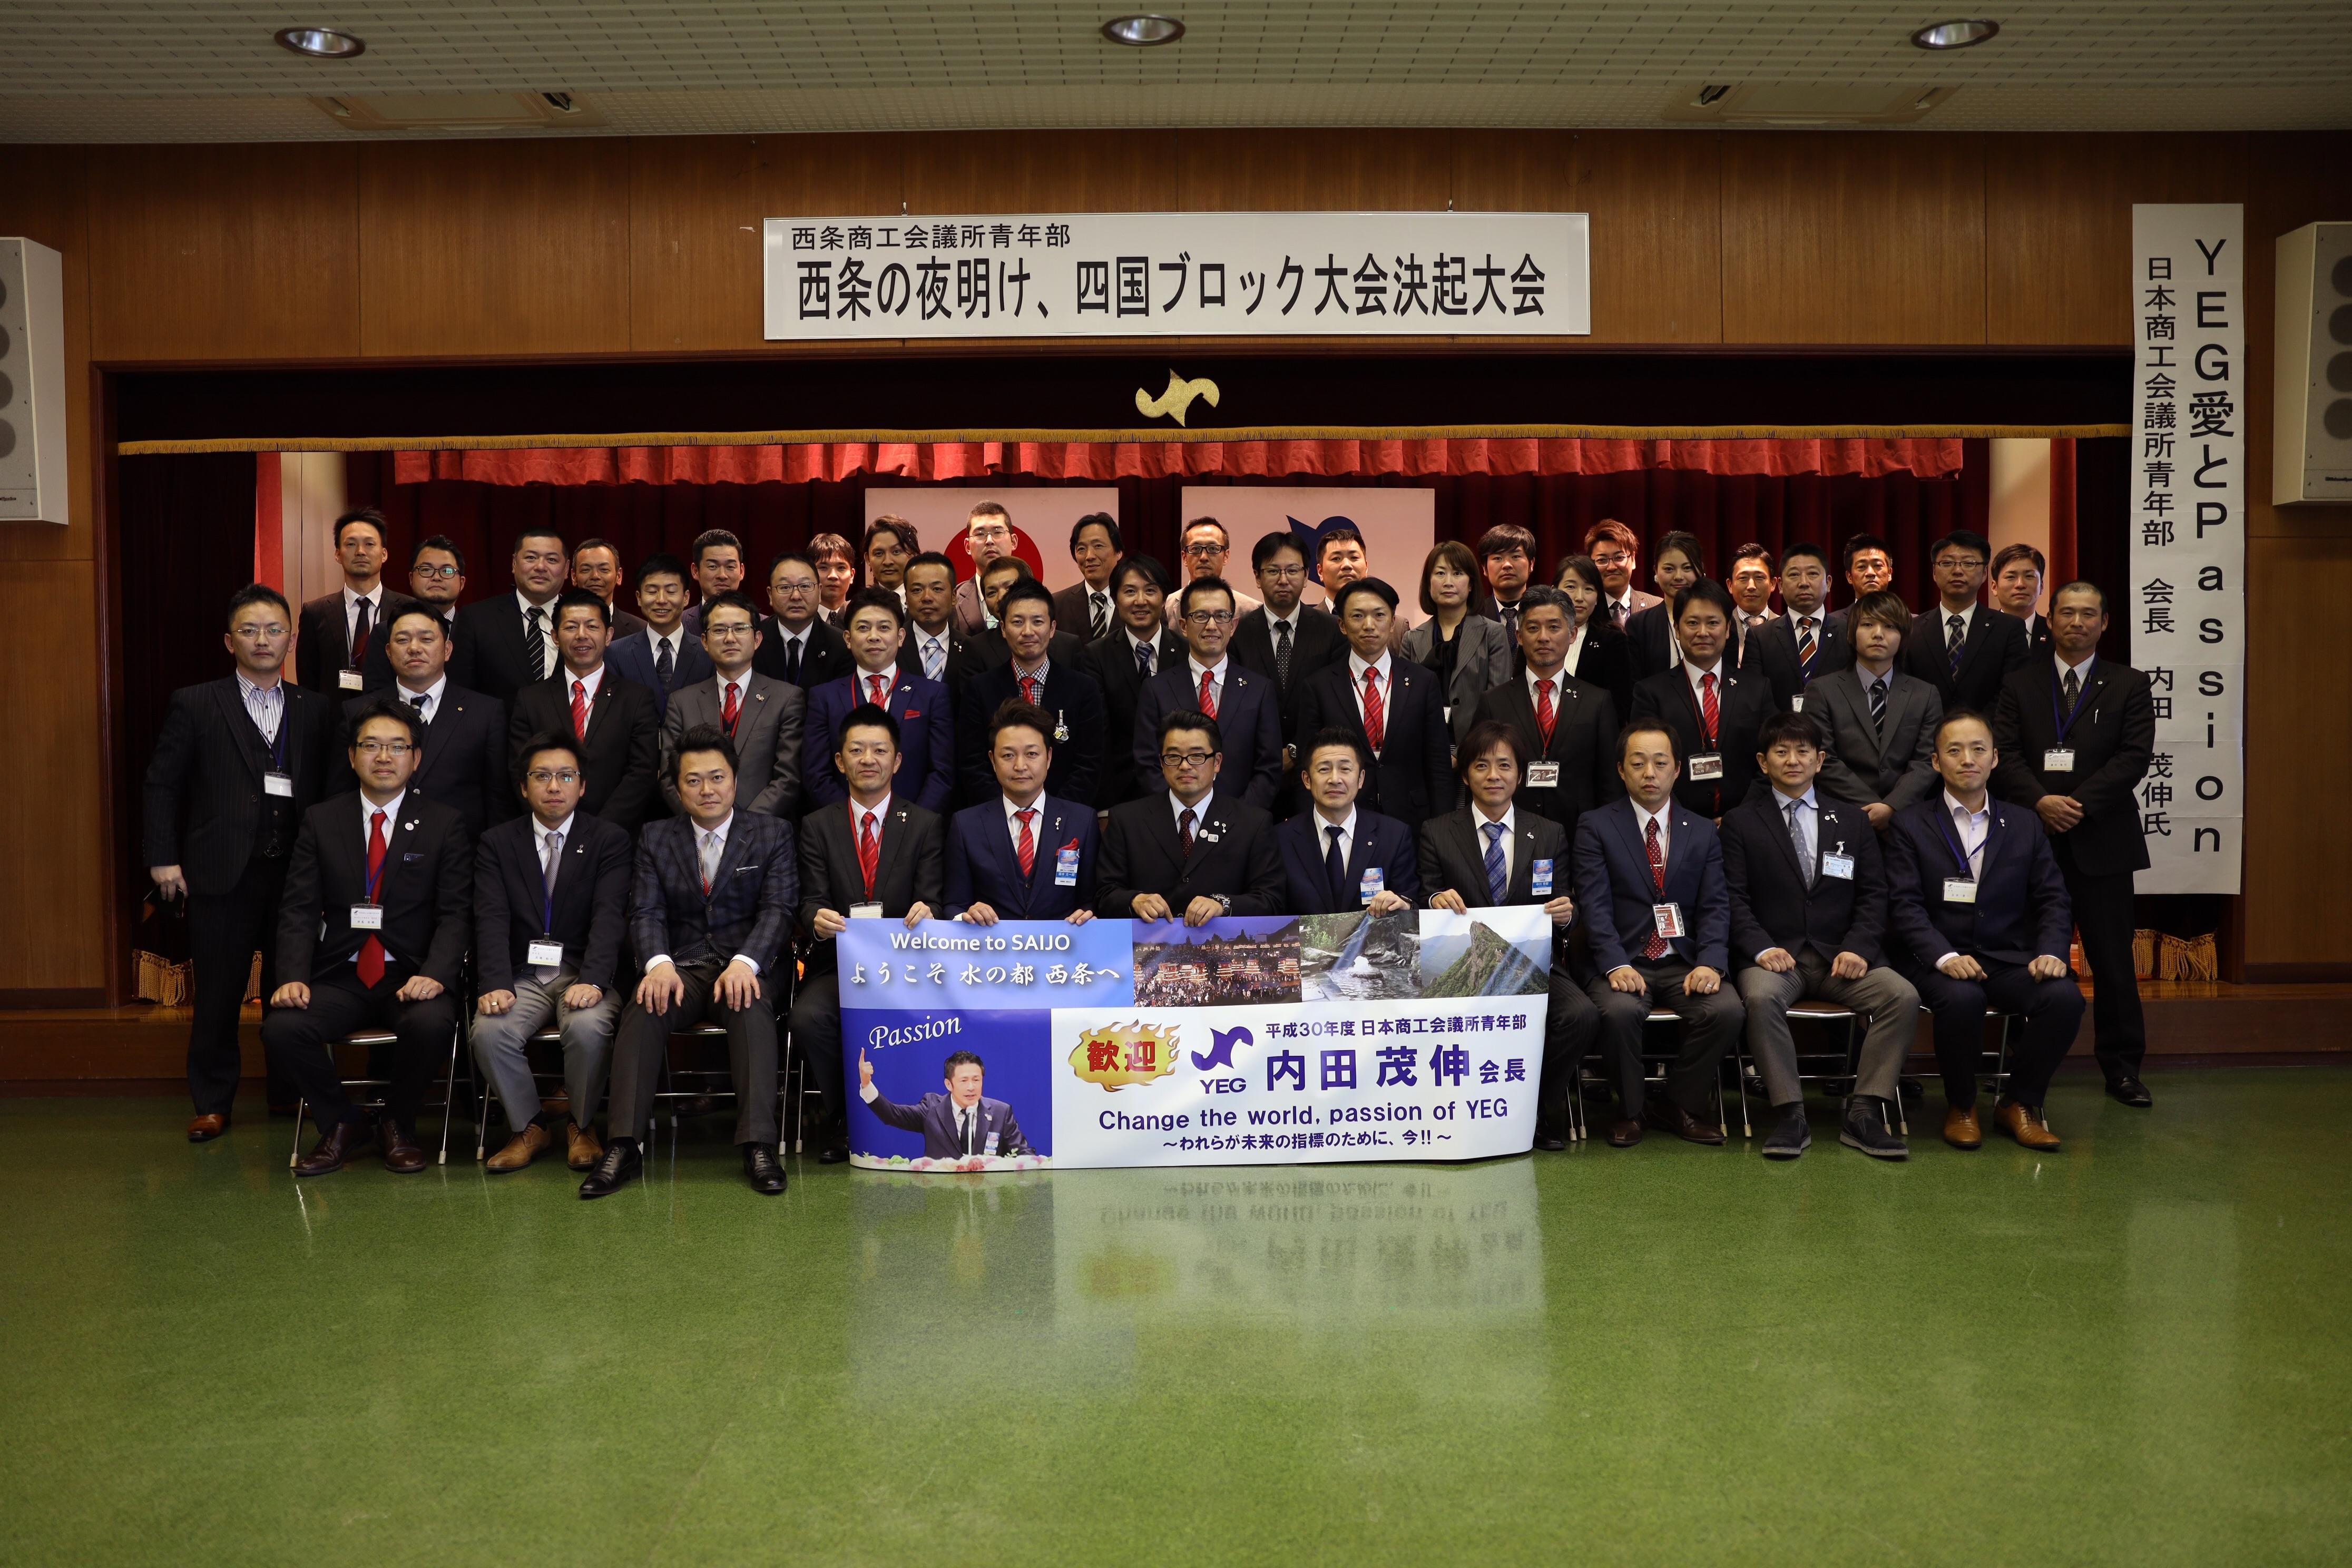 f:id:masanori-kato1972:20190331105557j:image